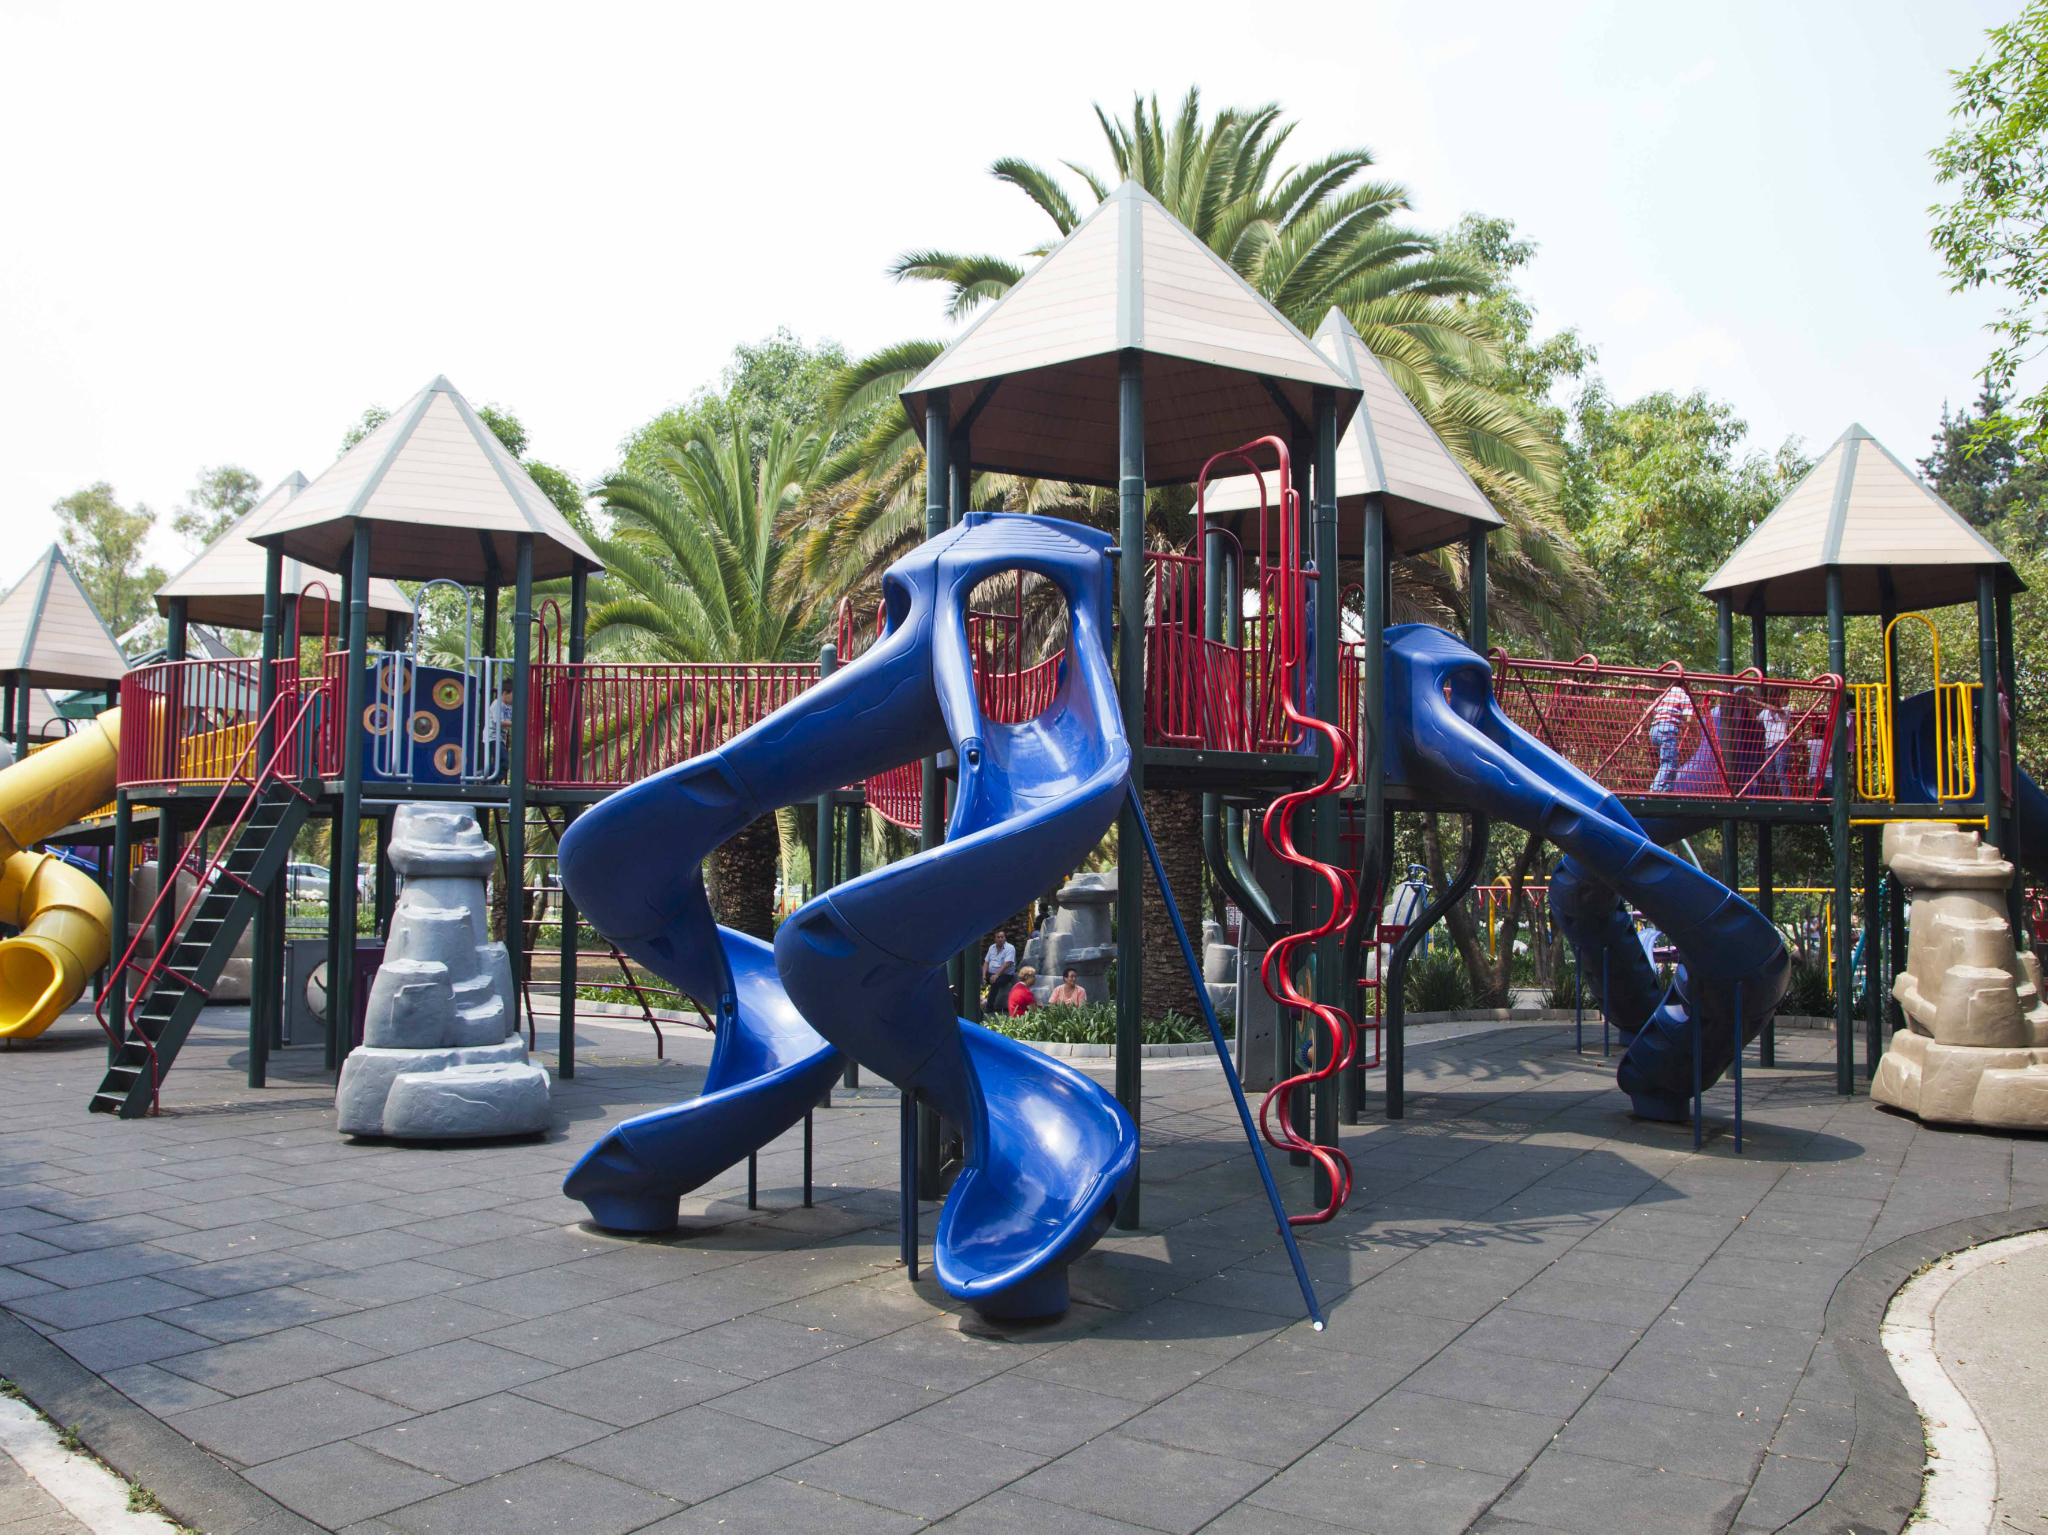 Parque La Tapatía